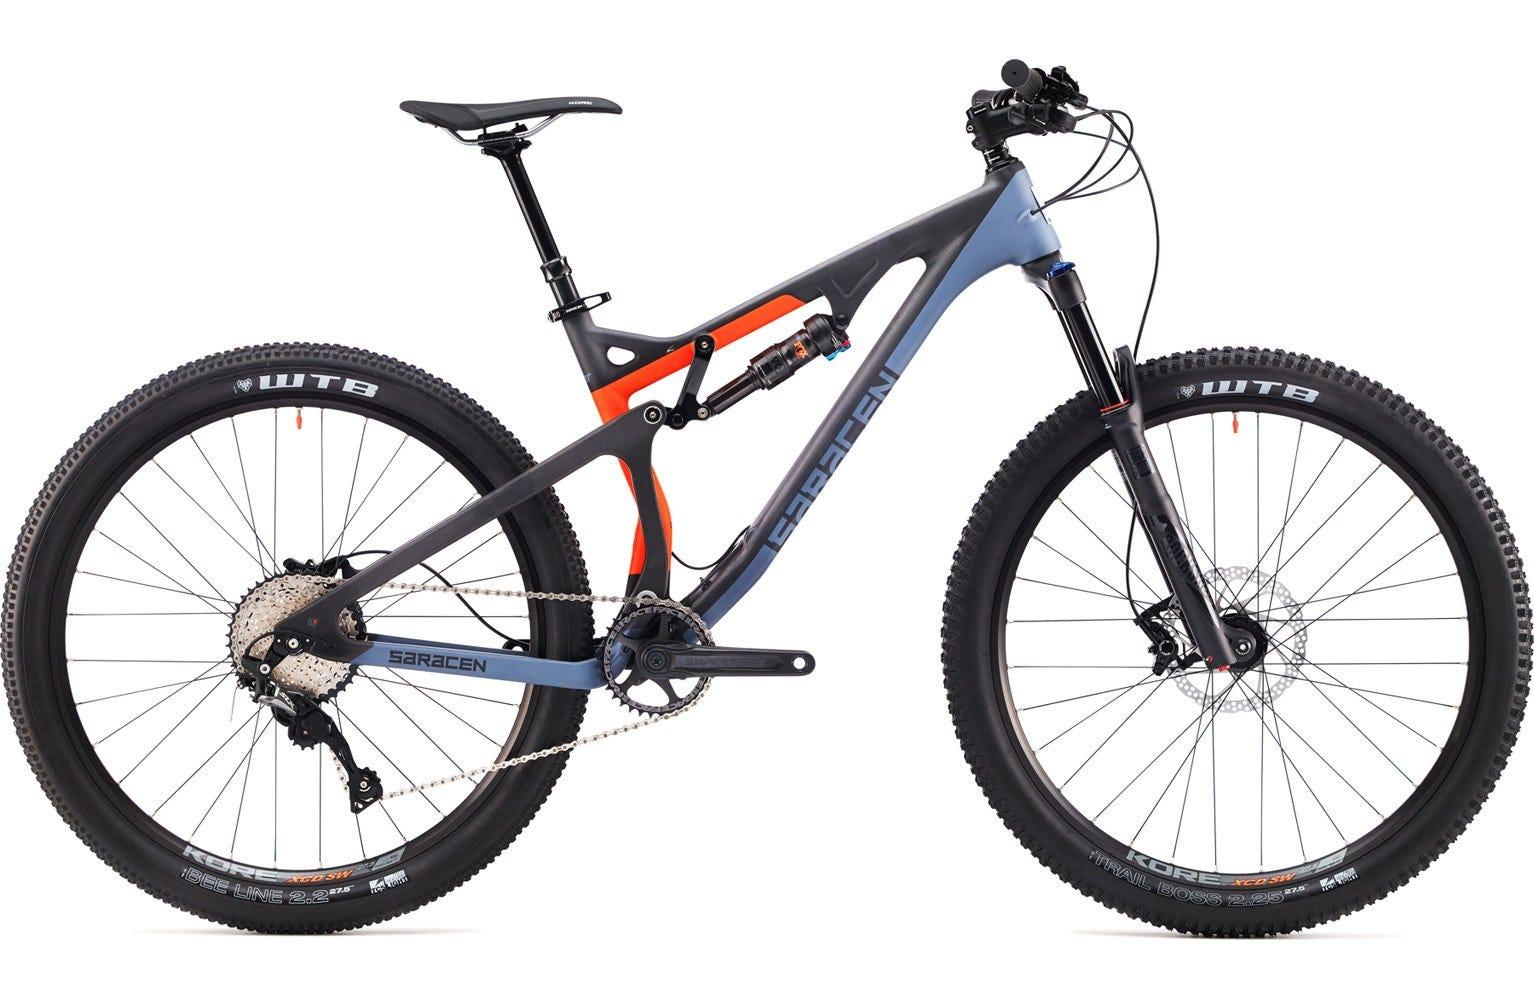 Saracen Kili Flyer Pro 19 inch bike Ex Display